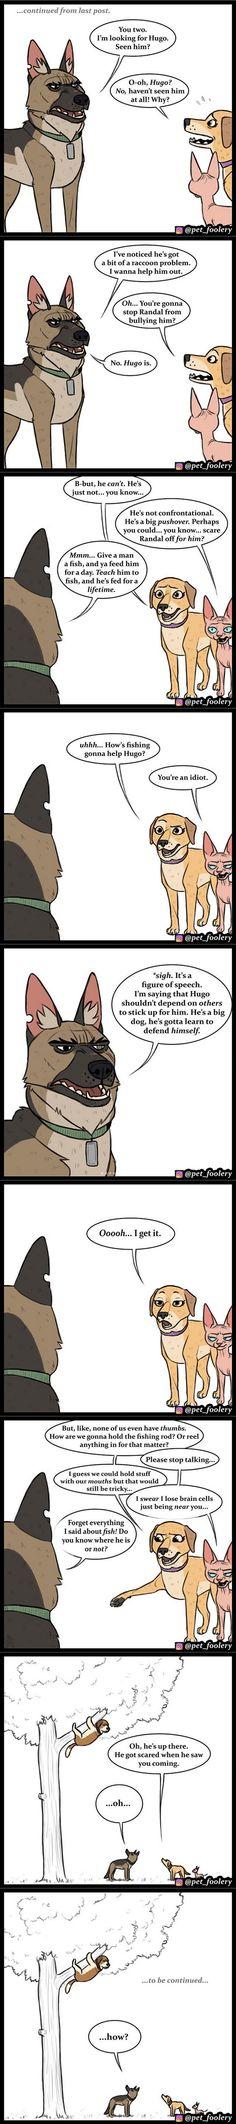 Funny Animal Comics, Cute Comics, Funny Animal Memes, Animal Quotes, Cute Funny Animals, Funny Animal Pictures, Funny Cute, Funny Memes, Jokes